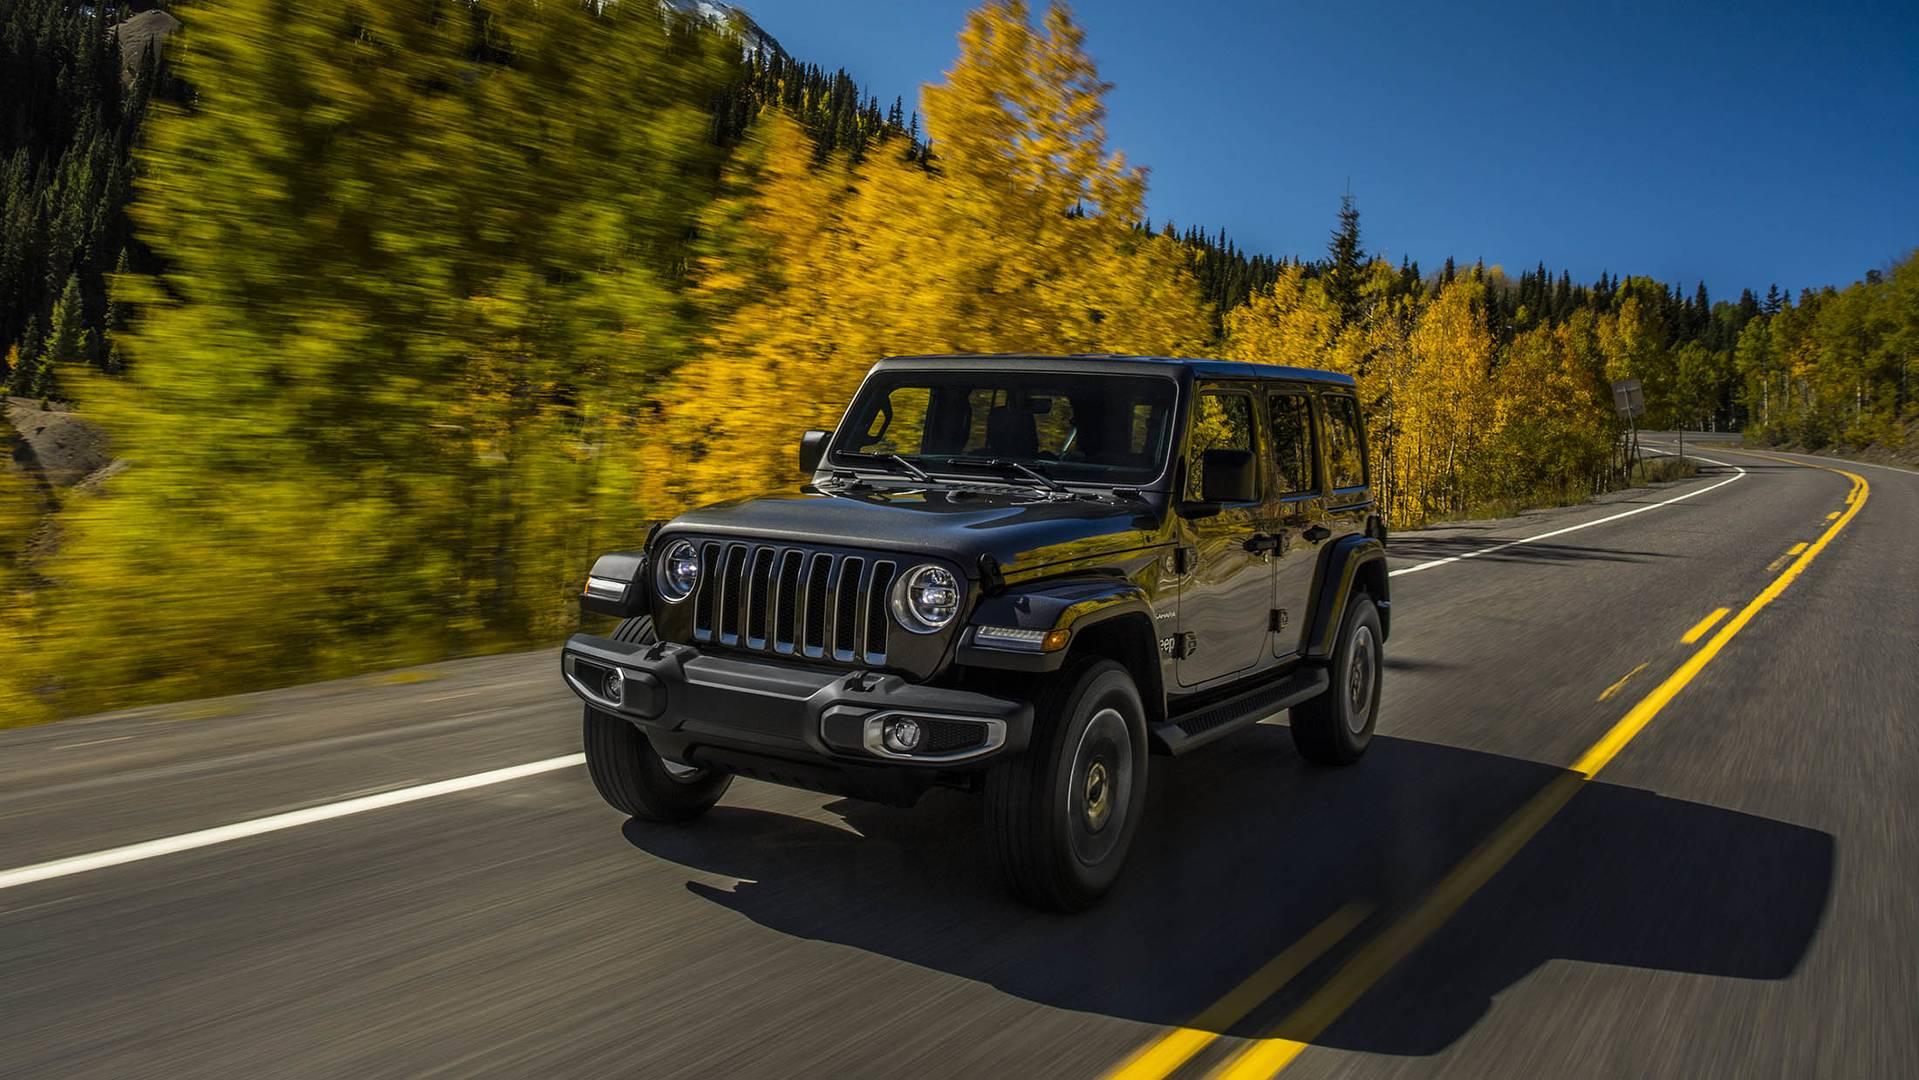 2018 Jeep Wrangler Price List: JL Starts At $26,995, JLU ...